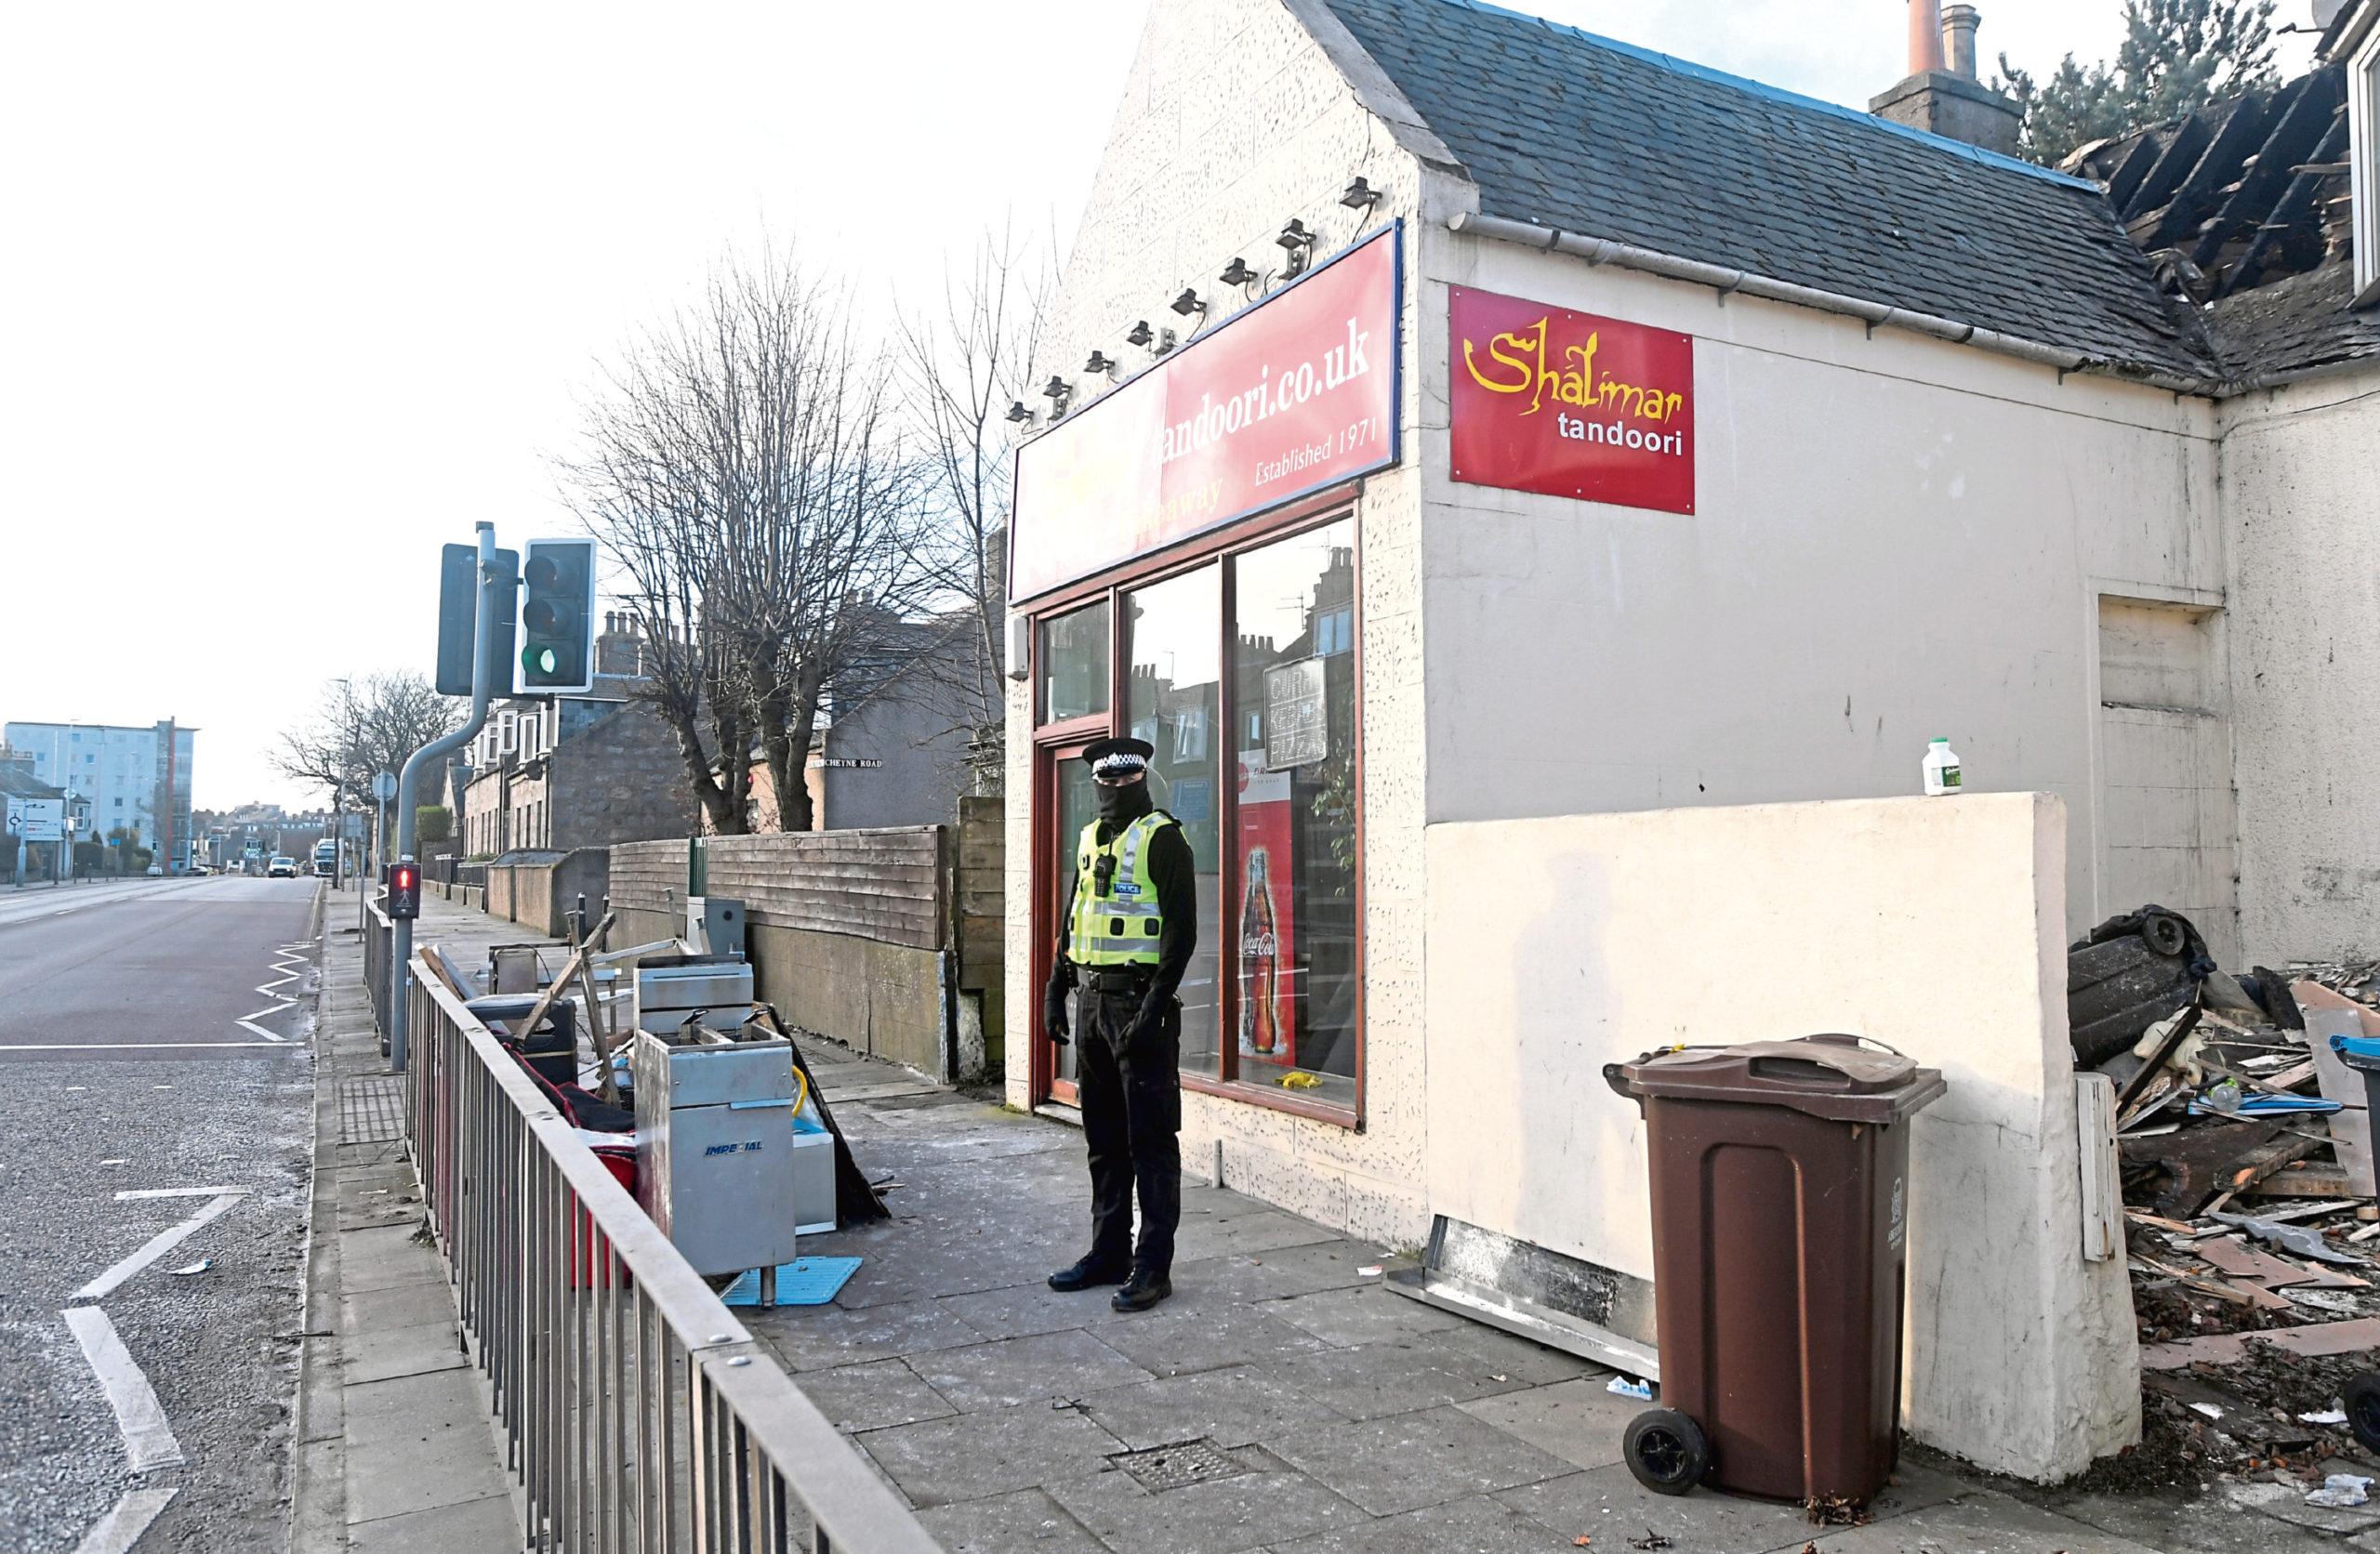 Shalimar Tandoori on King Street, Aberdeen.